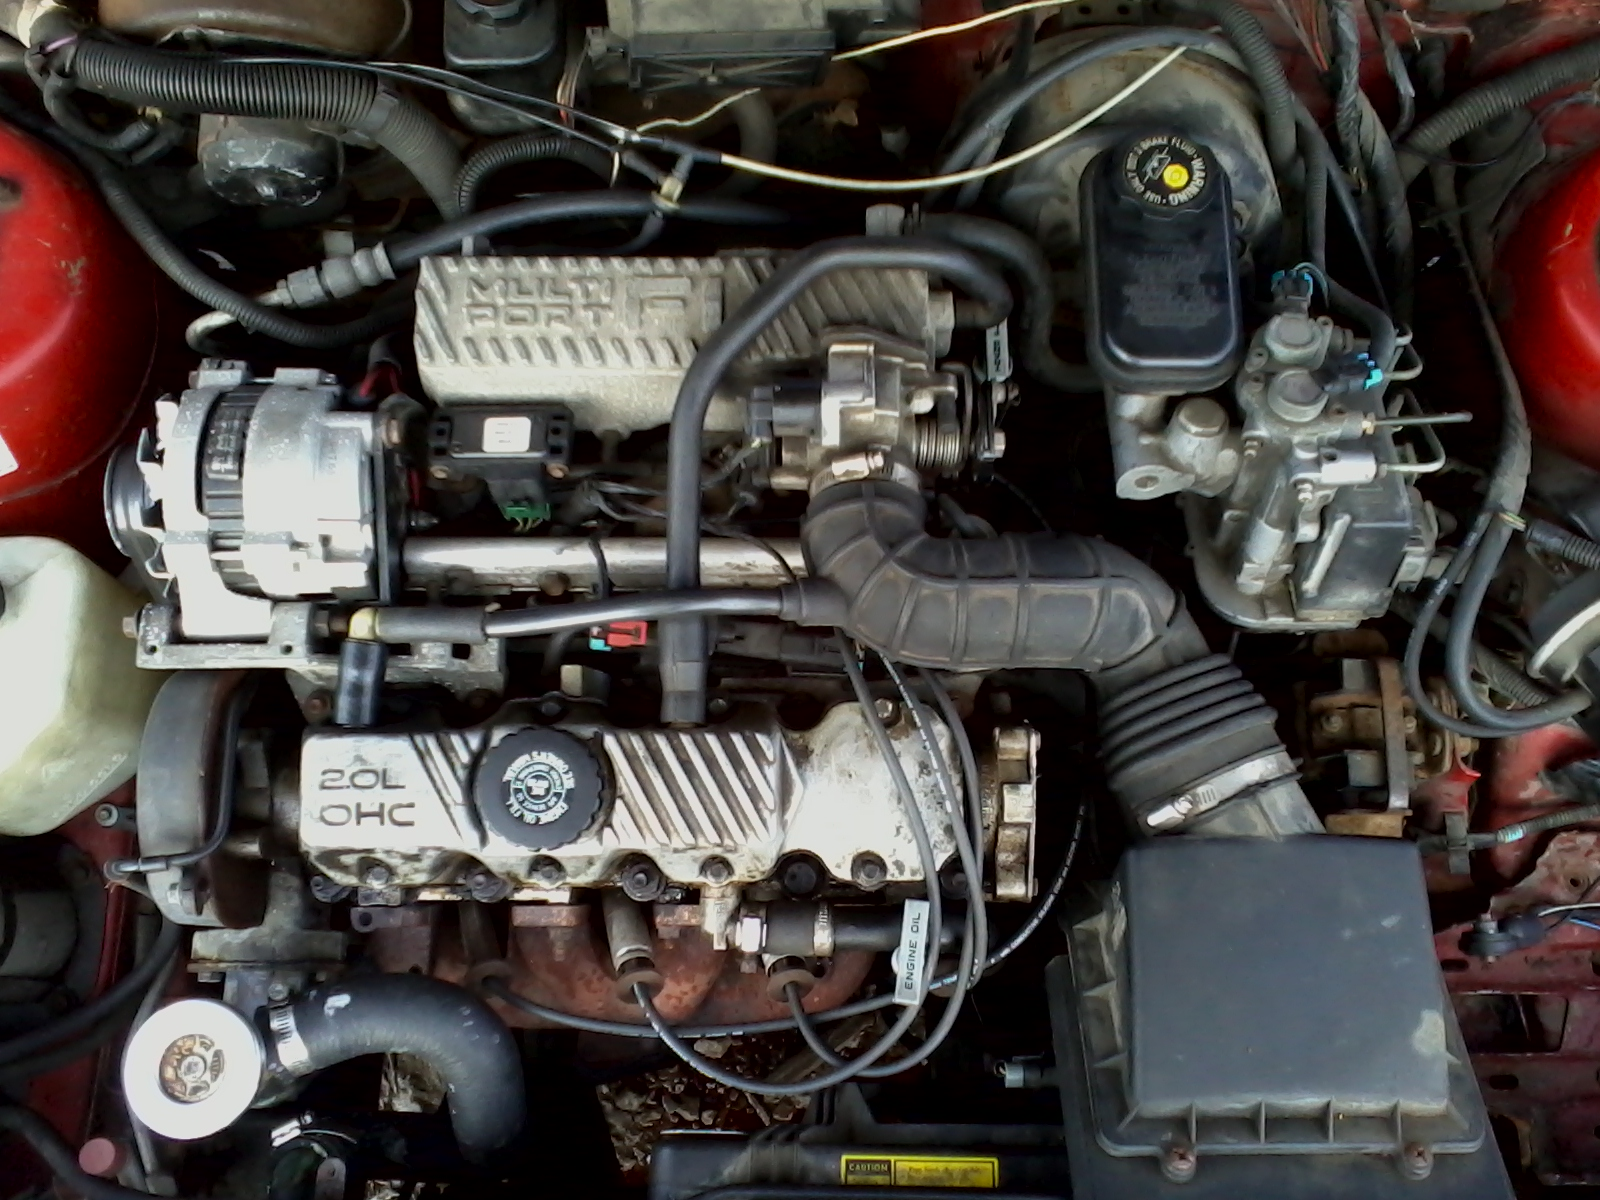 File:Pontiac 2.0 L SOHC I4 engine.jpg - Wikimedia Commons